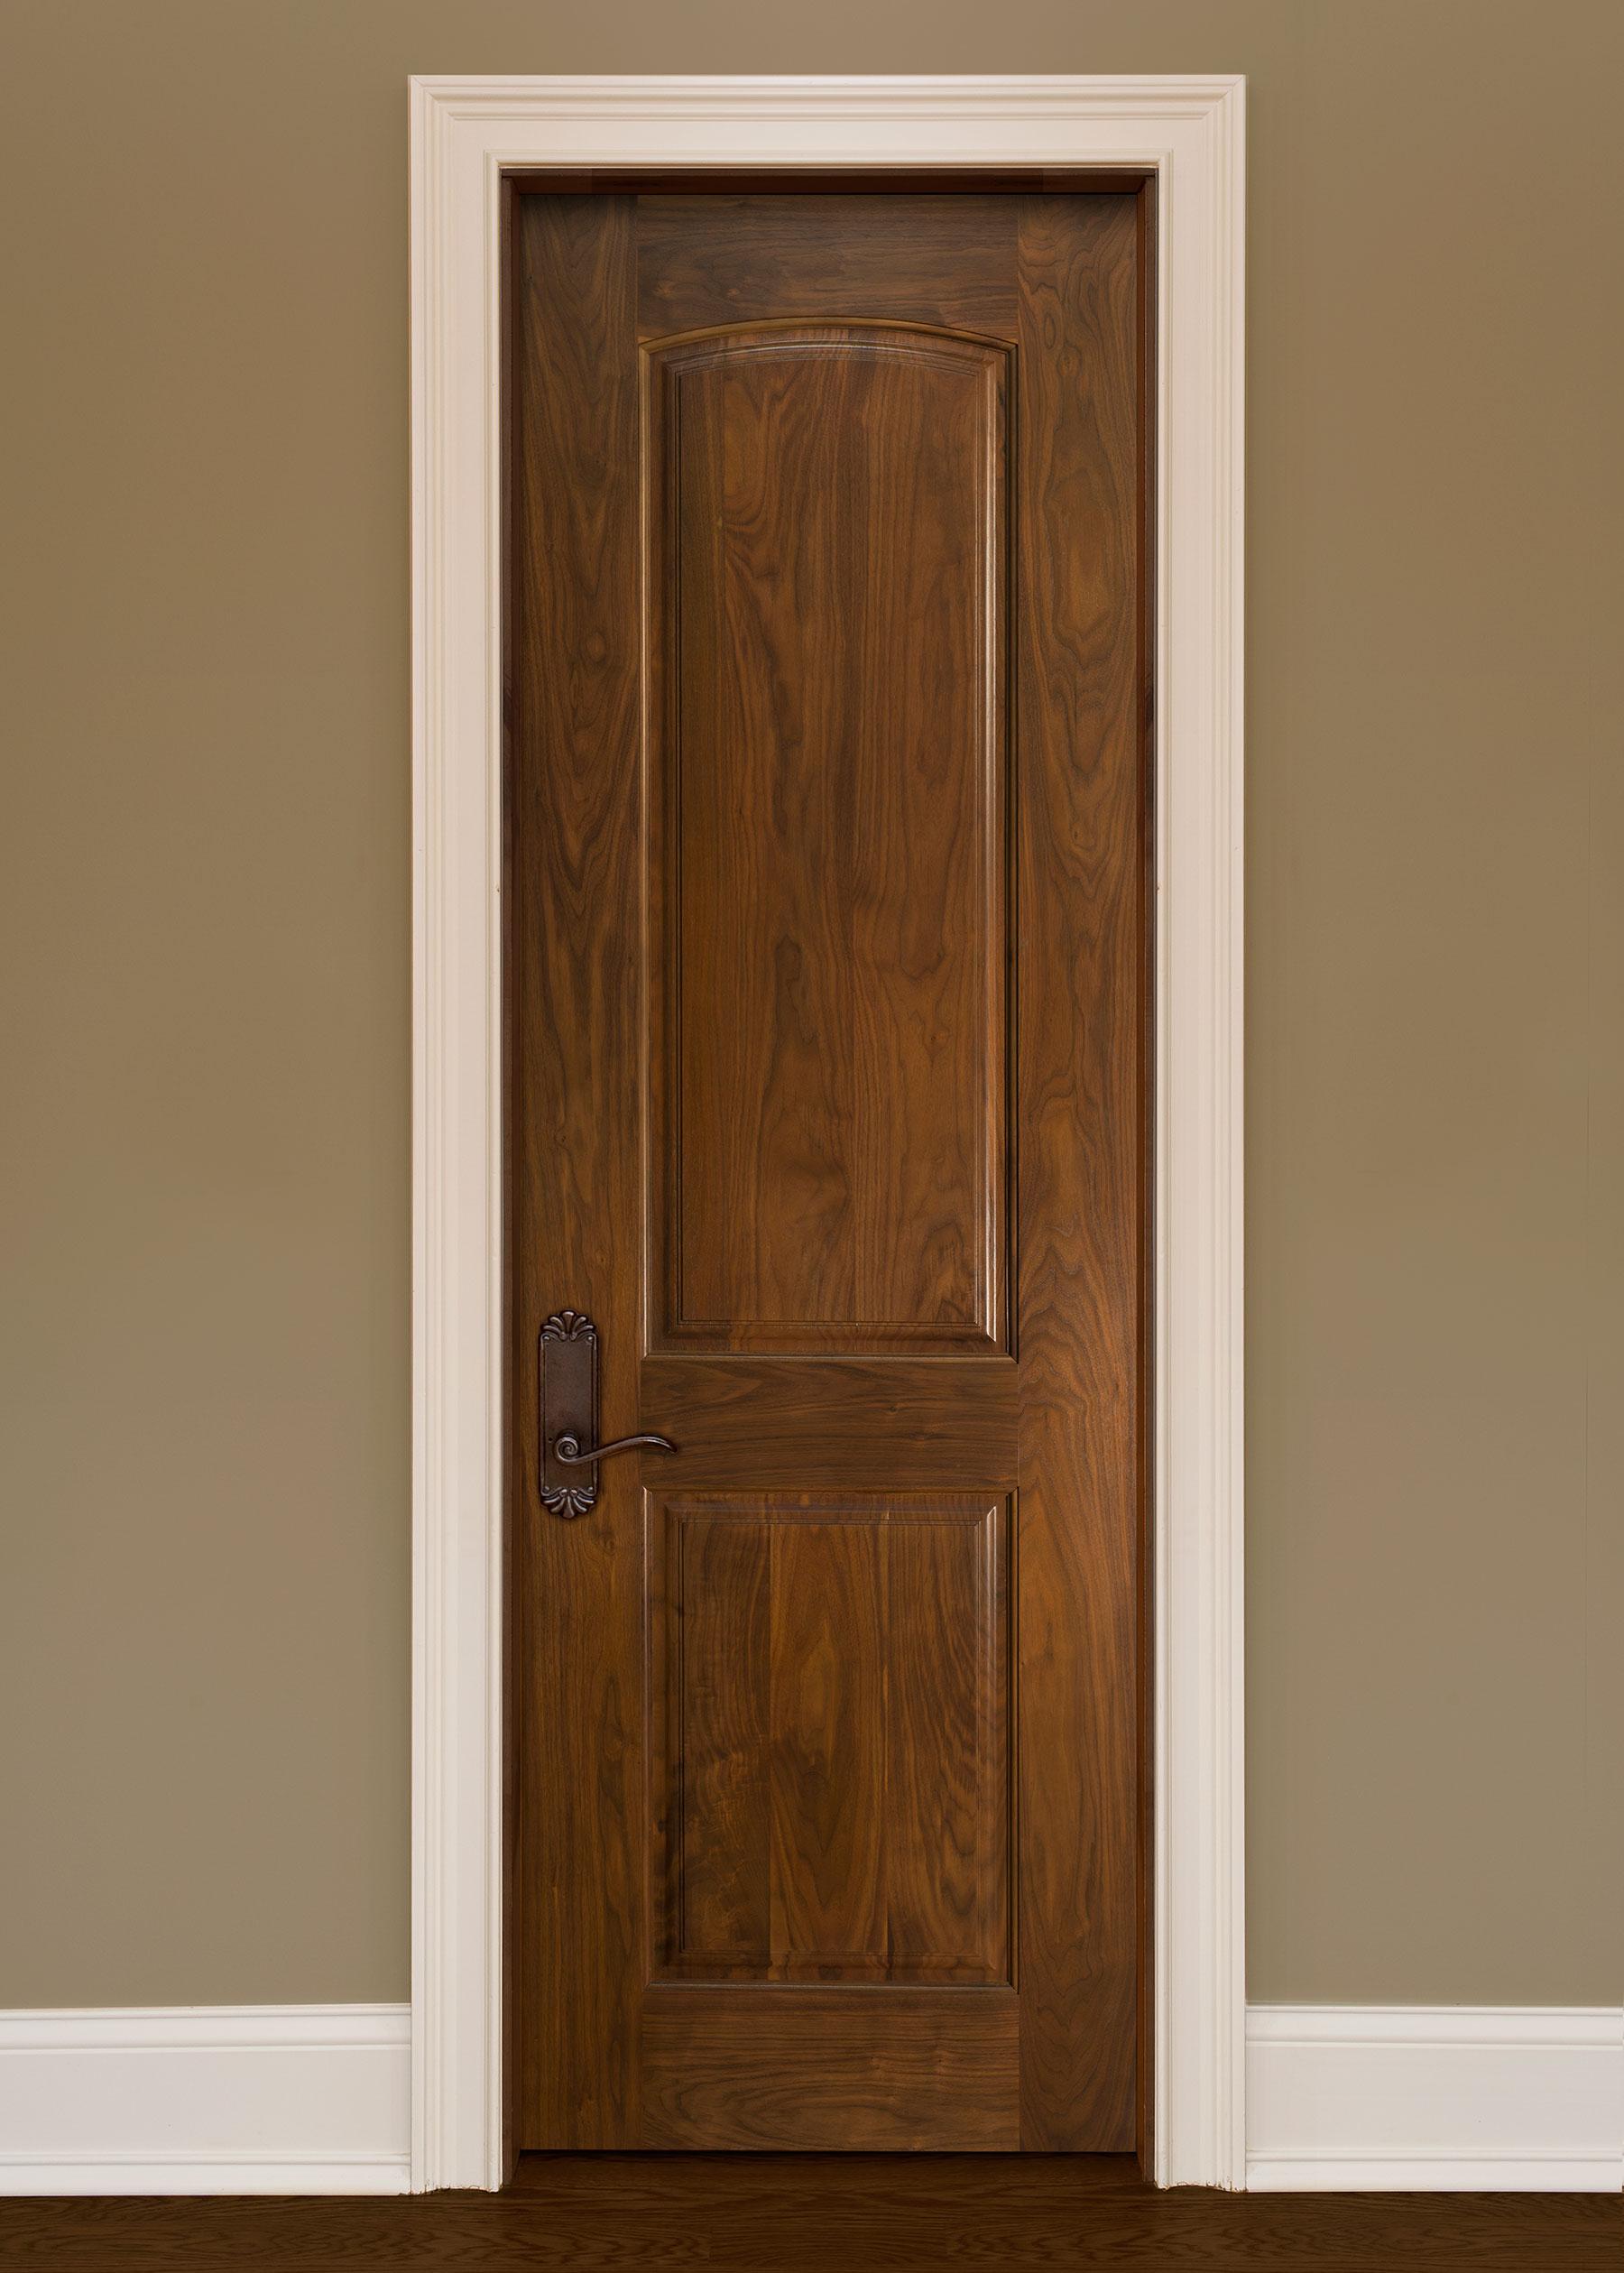 Custom Wood Interior Doors | Custom Interior 2 Panel Solid Wood Door GDI-701B - Glenview Haus - Custom Doors, Wine Cellars and Cabinets in Chicago